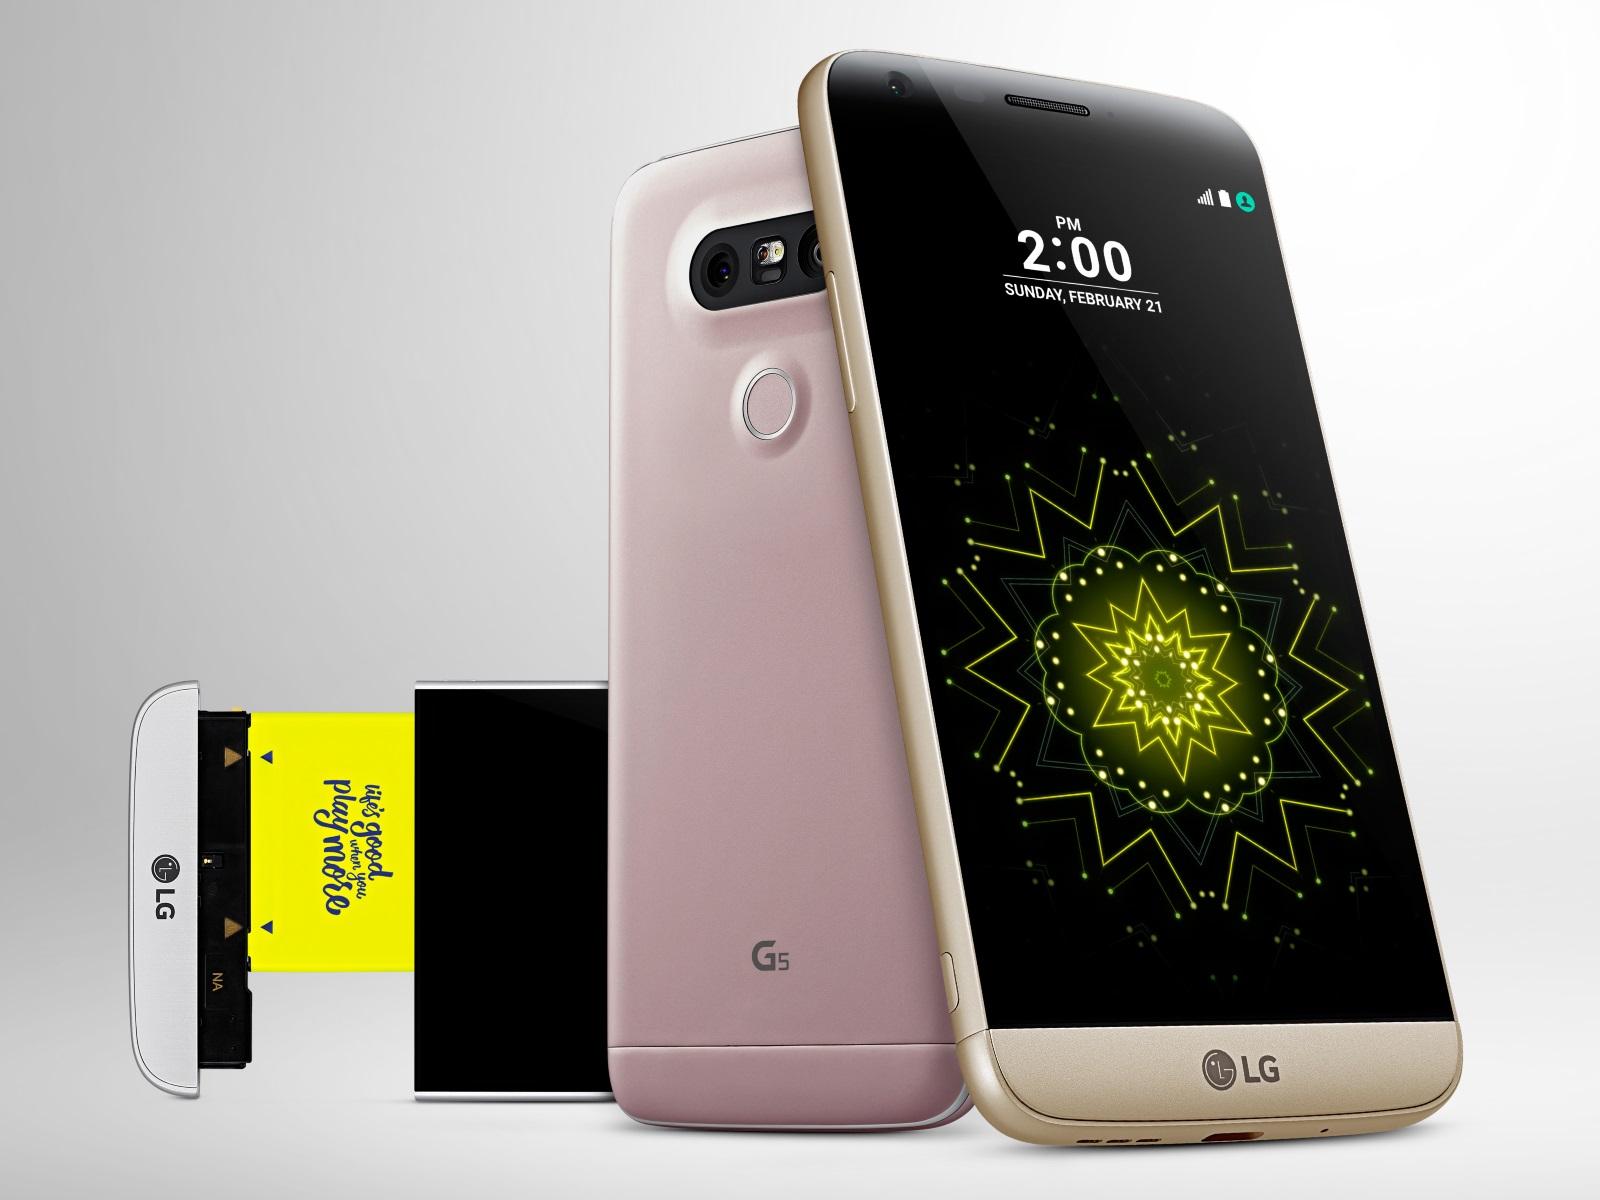 LG-G5 (2)